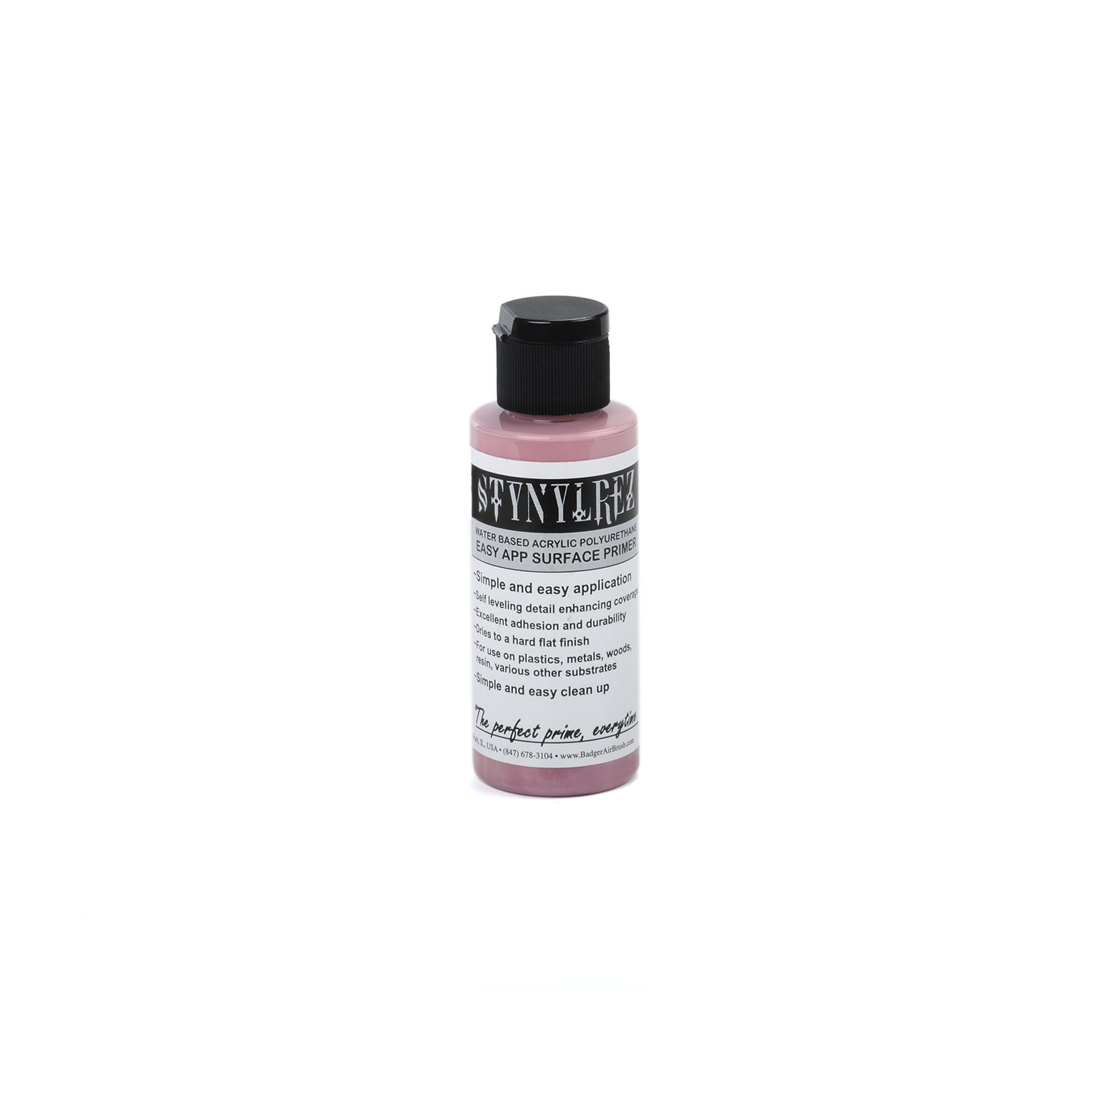 209 Badger Stynylrez pink 60 ml.